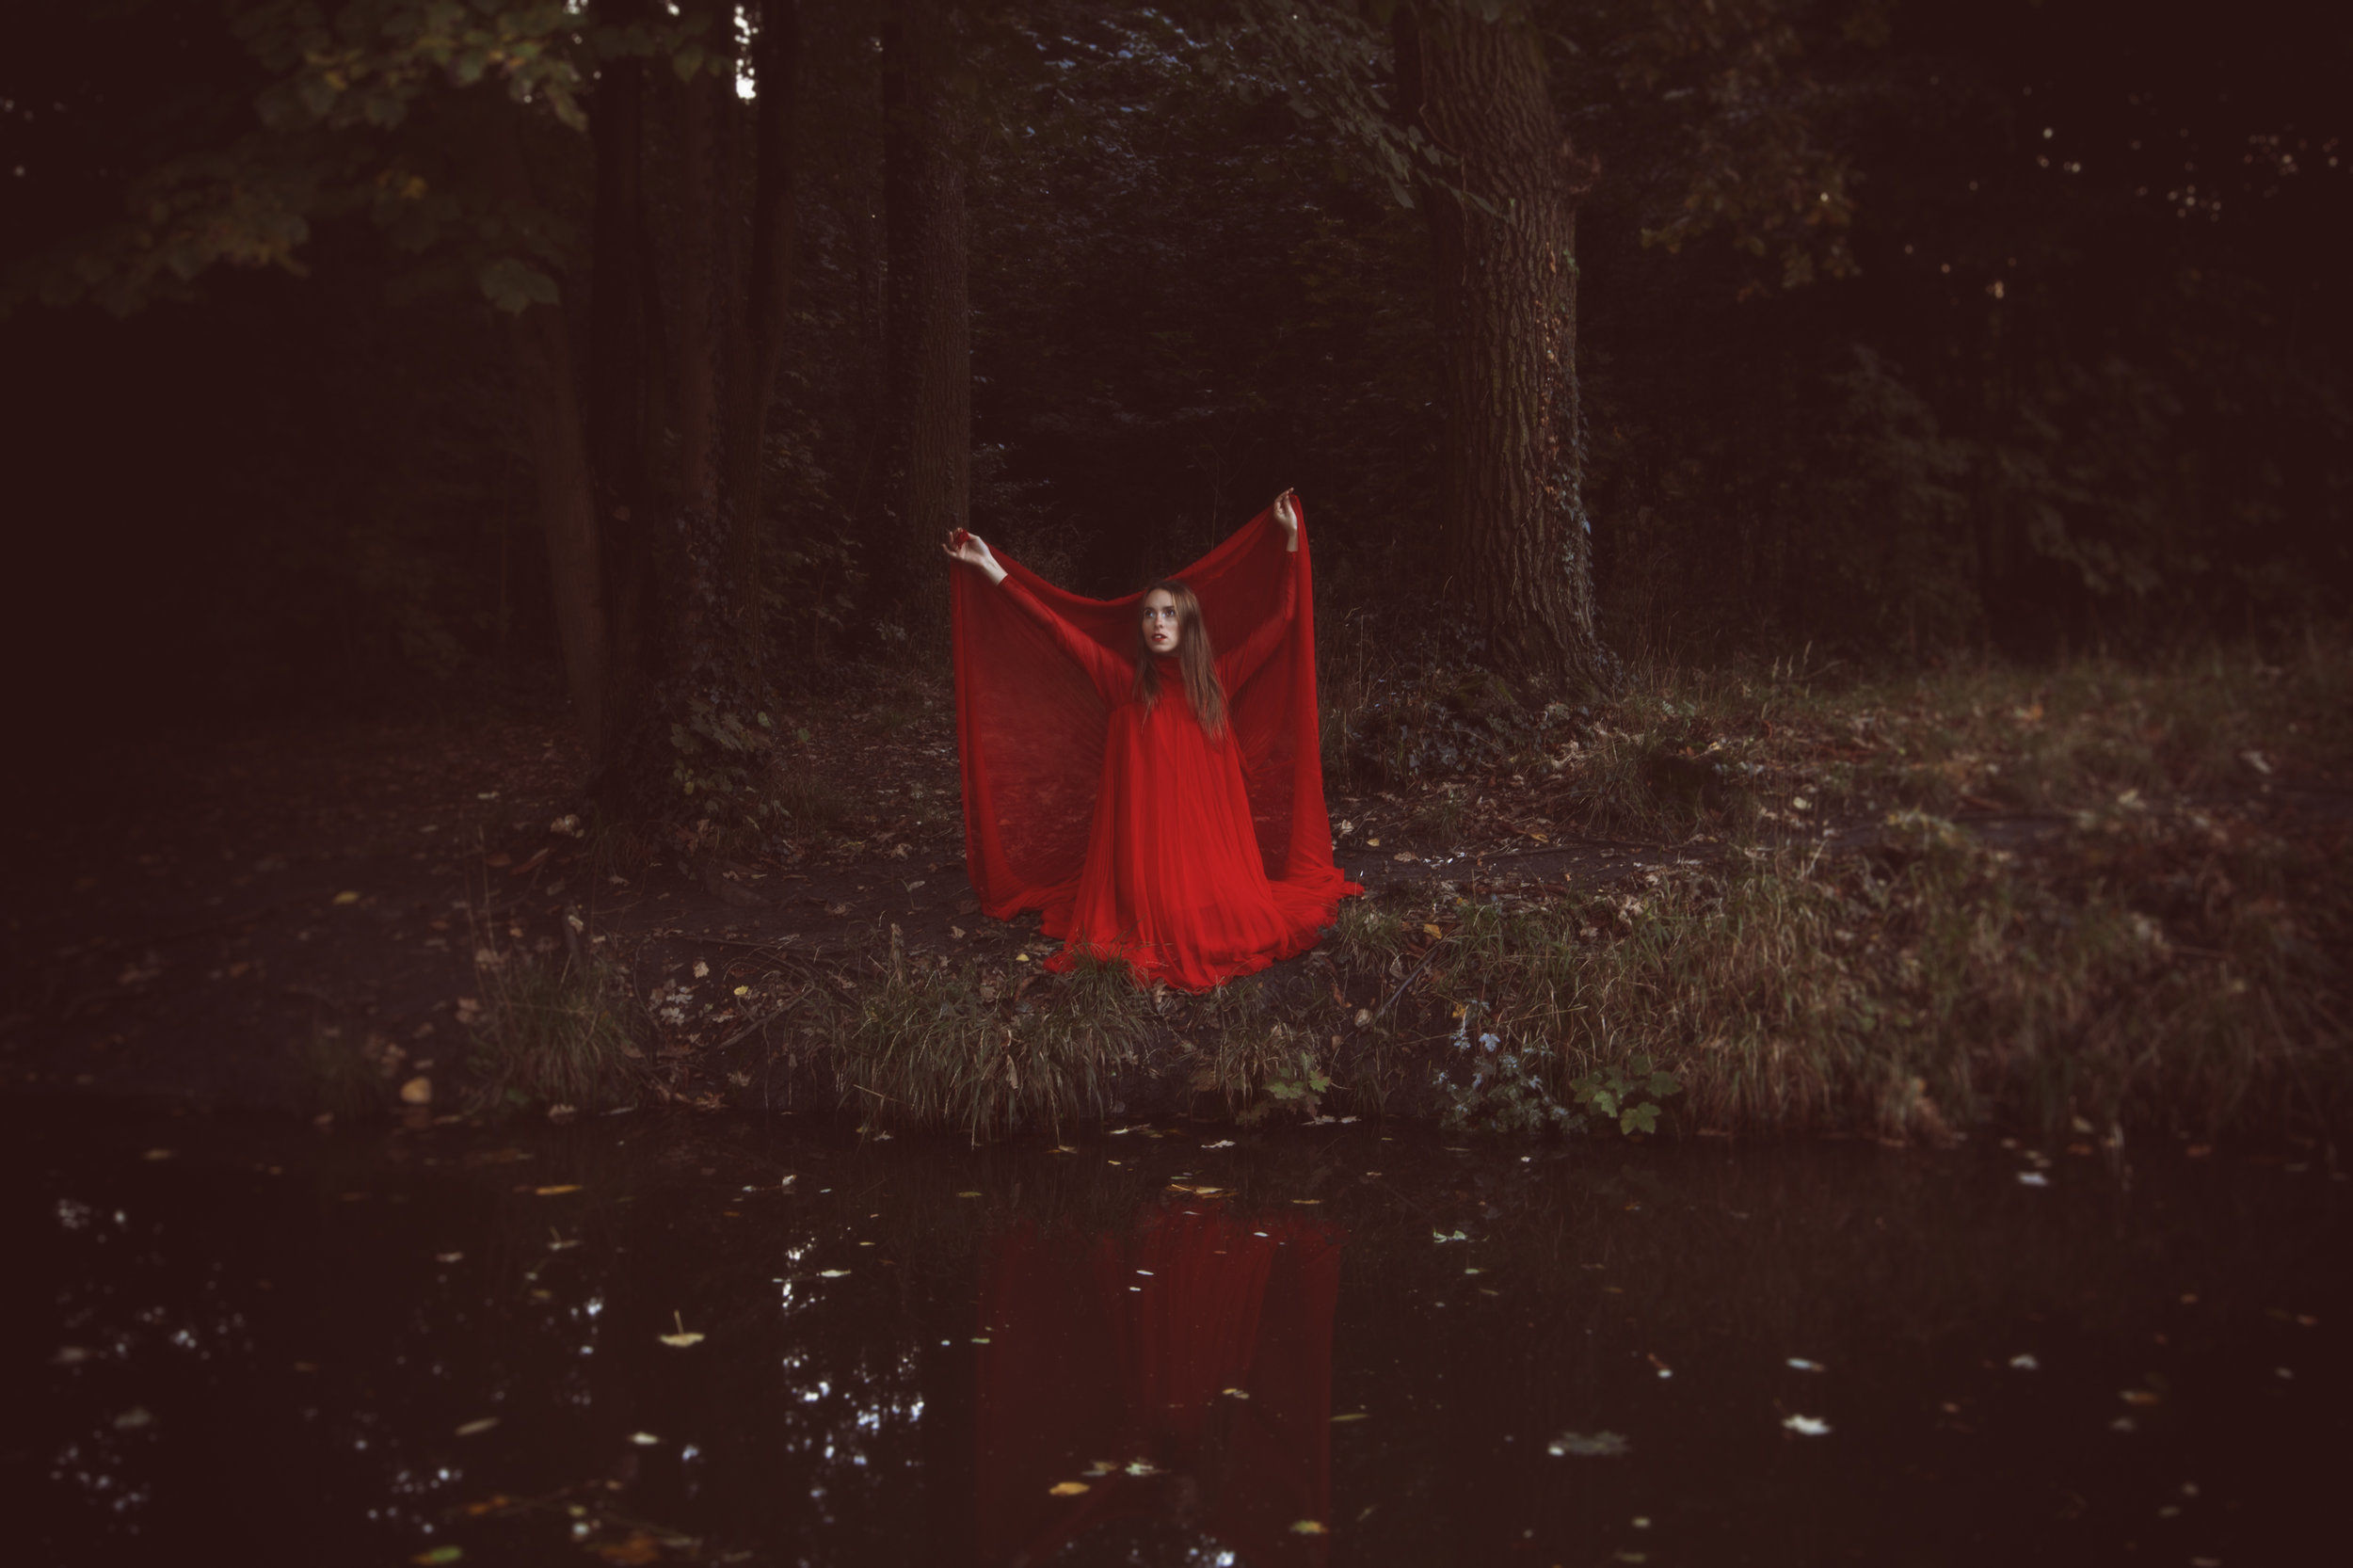 Mists Of Avalon, 2016 © Anouska Beckwith